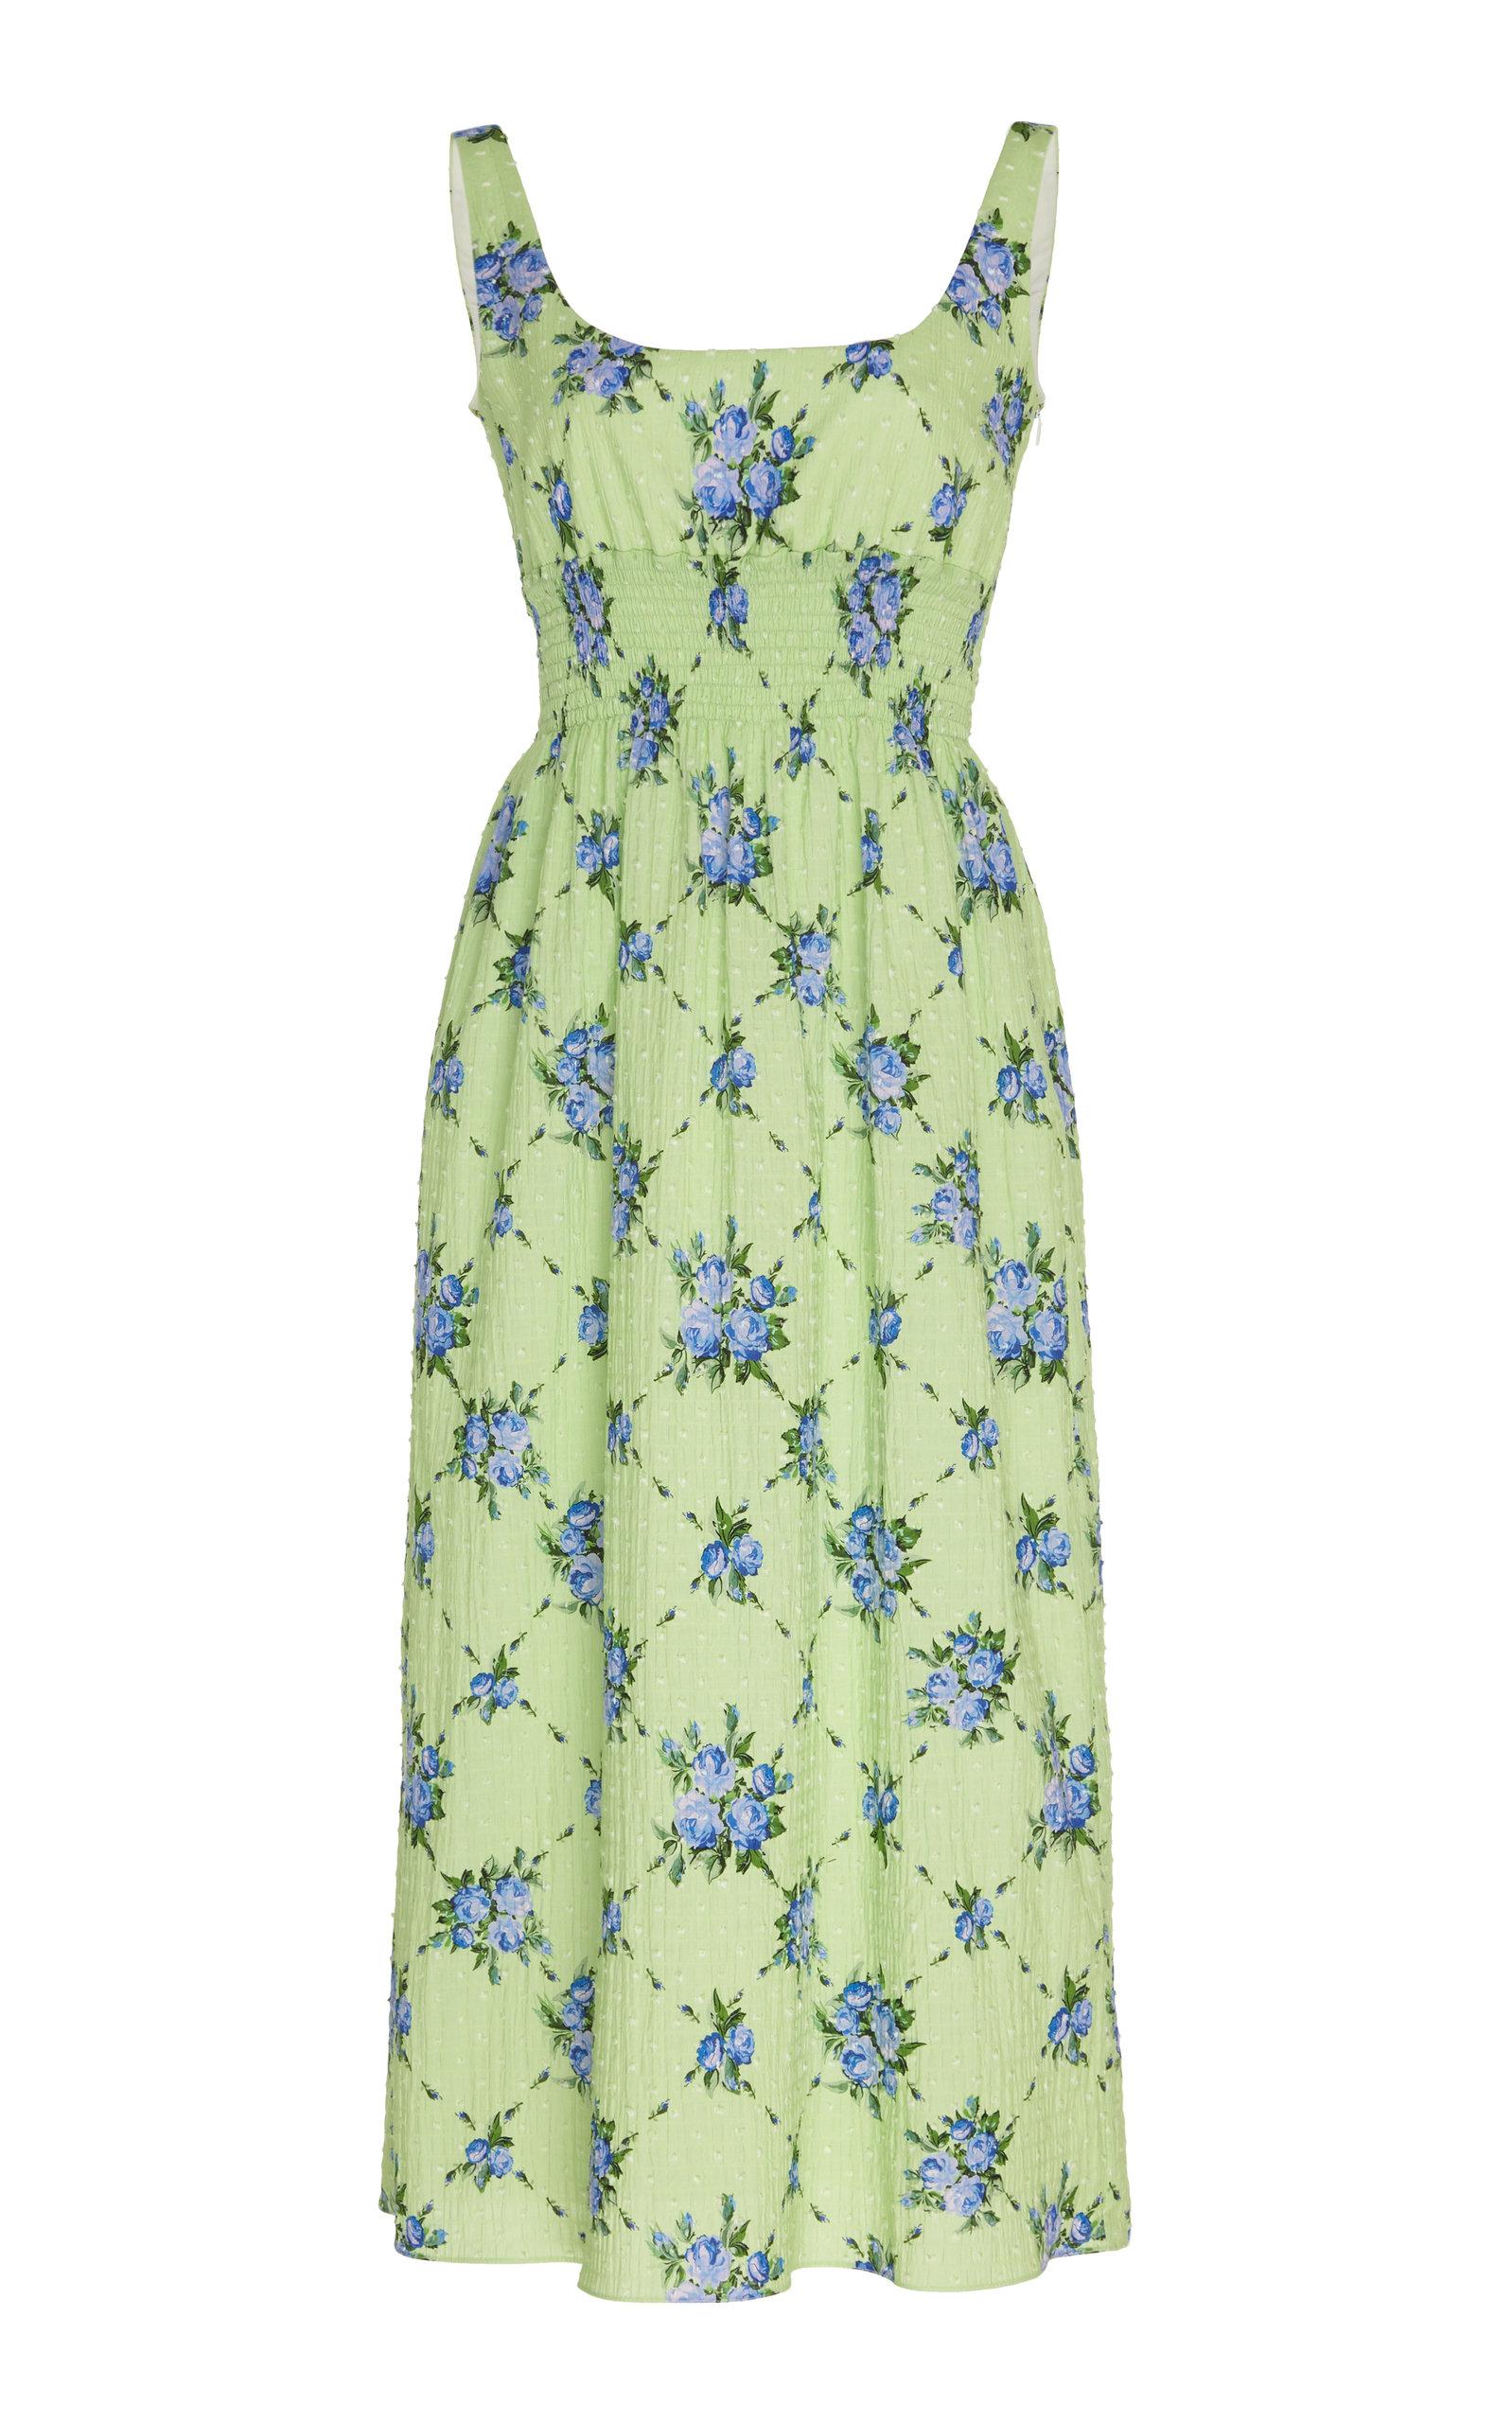 Buy Emilia Wickstead Floral-Print Cotton-Blend Dress online, shop Emilia Wickstead at the best price